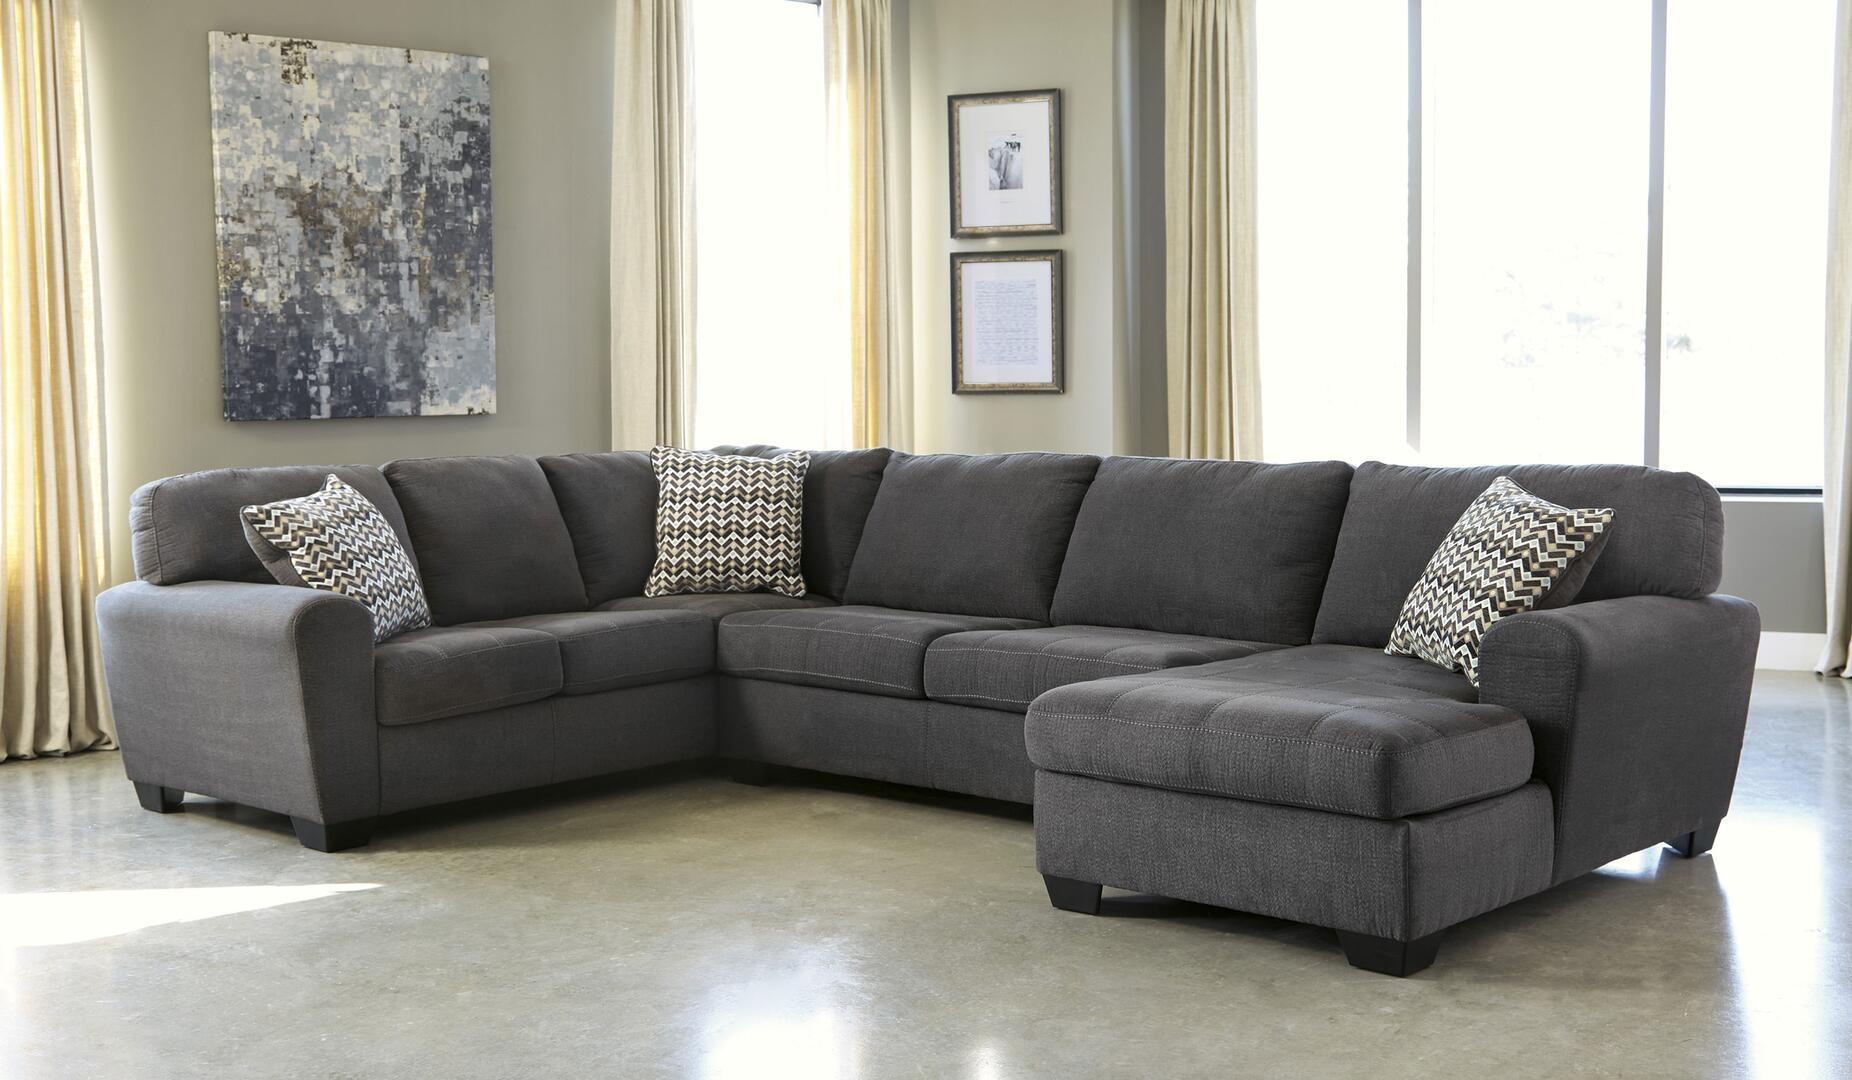 Benchcraft Sorenton Series Stationary Fabric Sofa